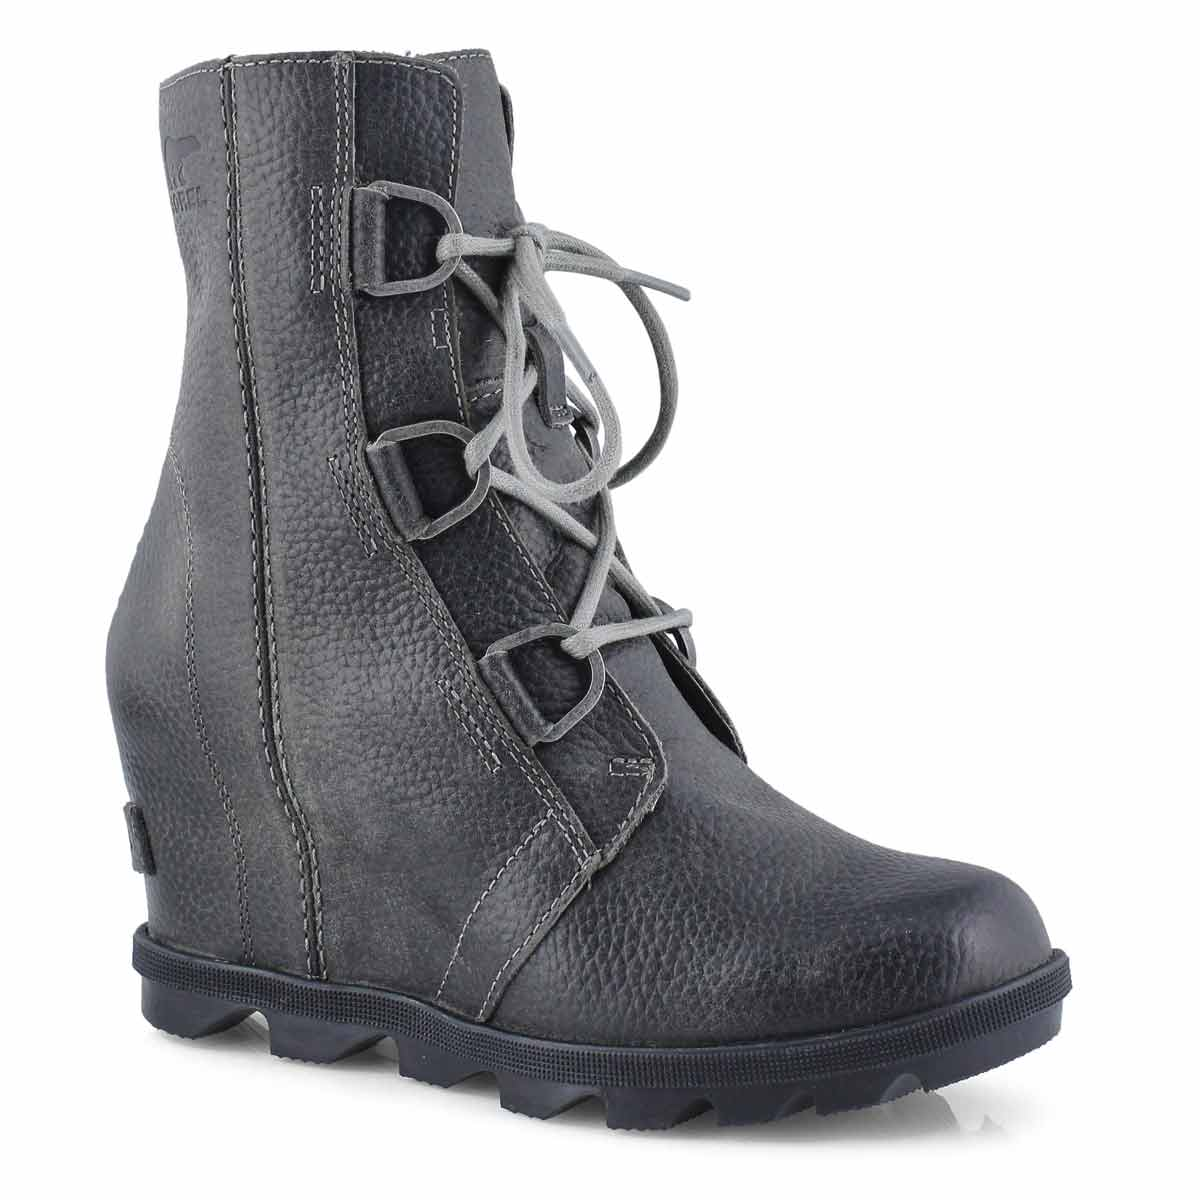 Lds JoanOfArcticWedgeII quarry wtpf boot